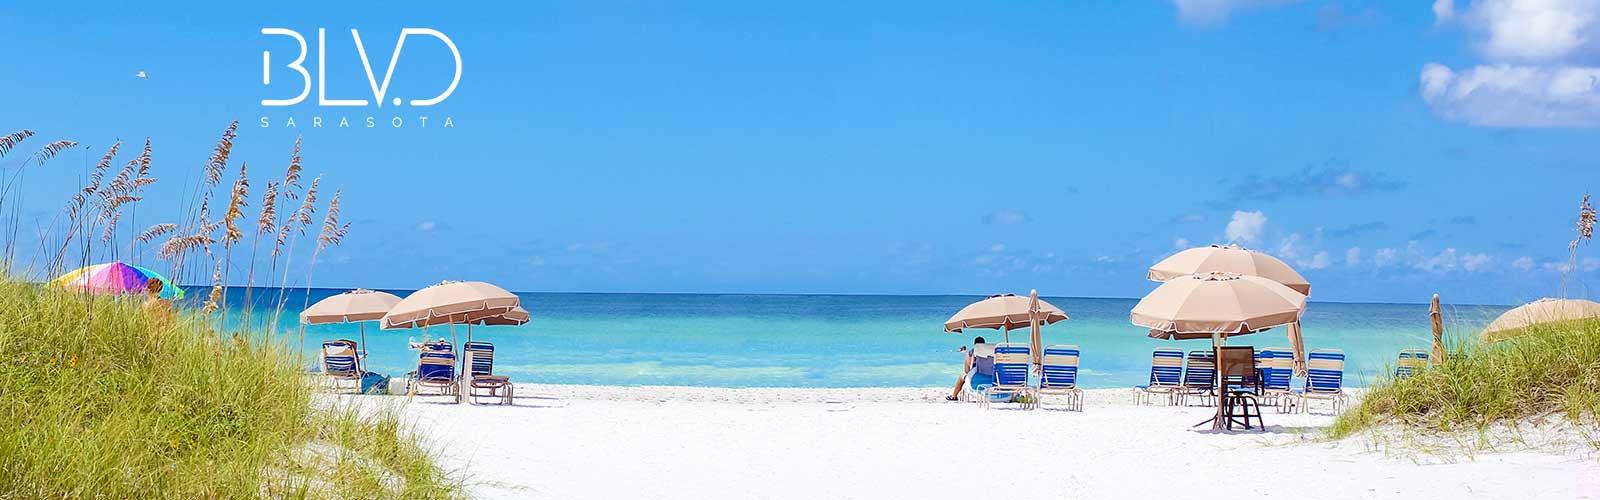 Siesta Key Sarasota Number 1 Beach in America, BLVD Sarasota